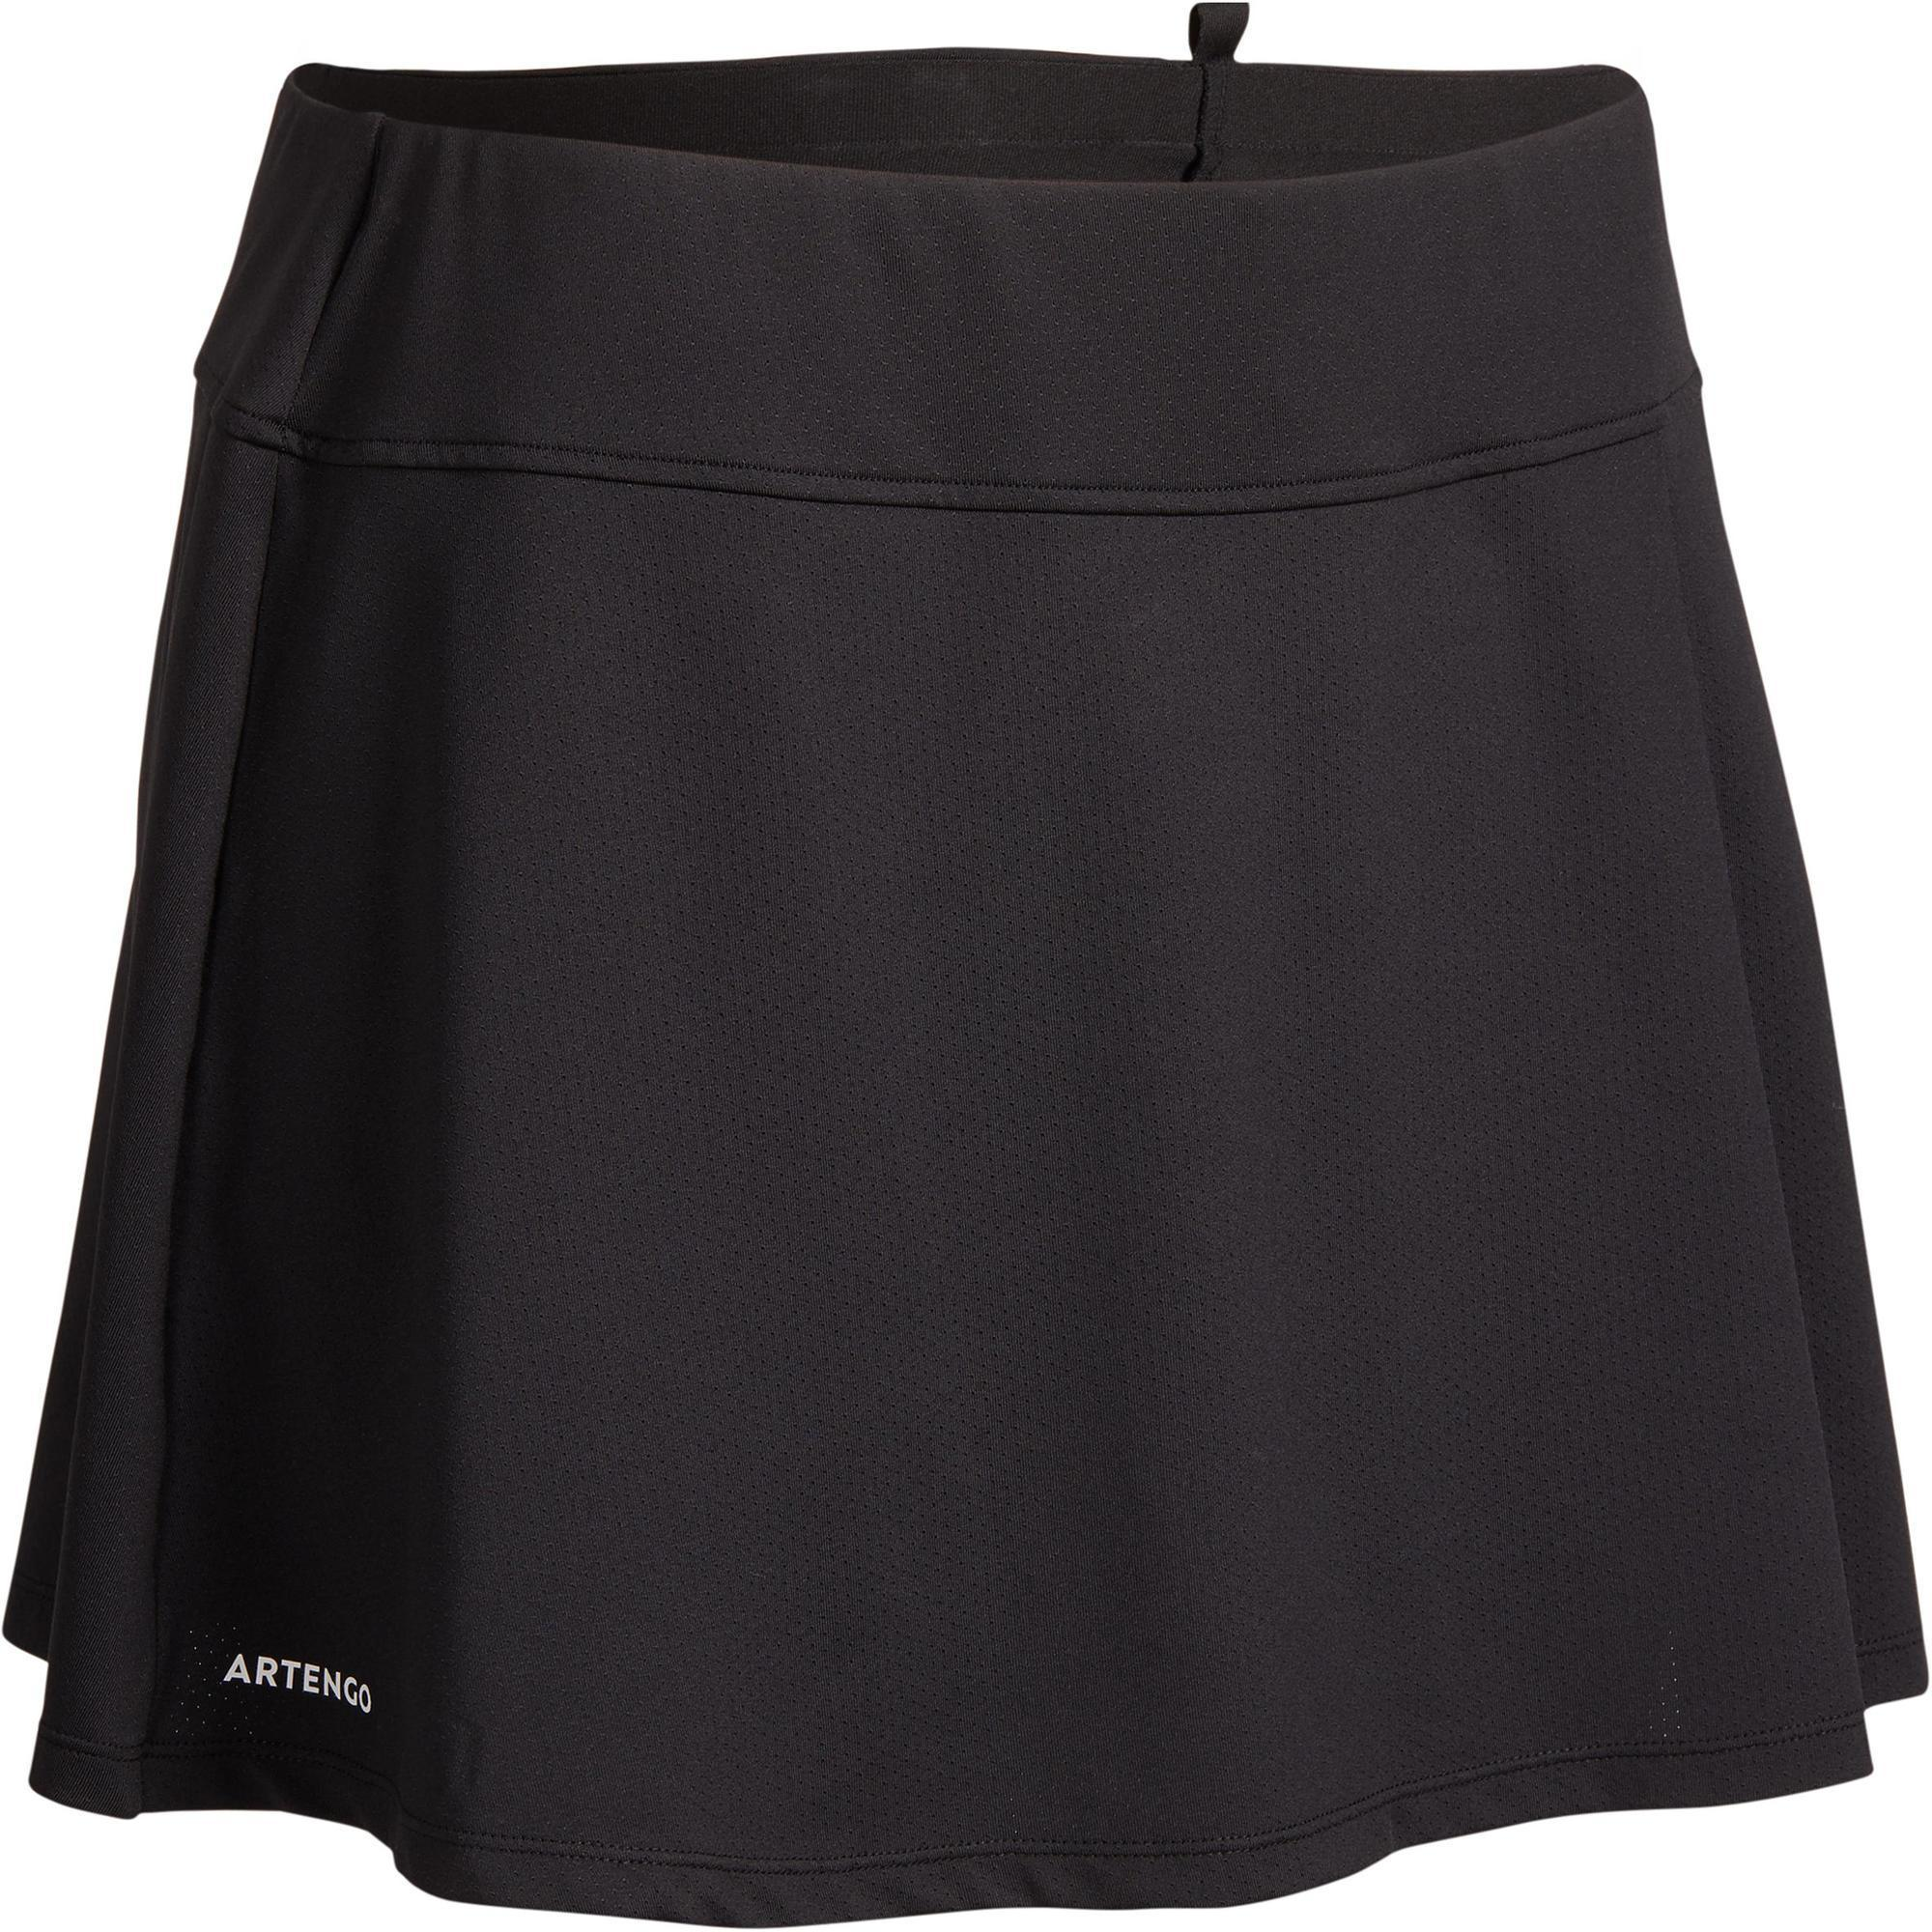 Artengo Tennisrokje SK Soft 500 zwart